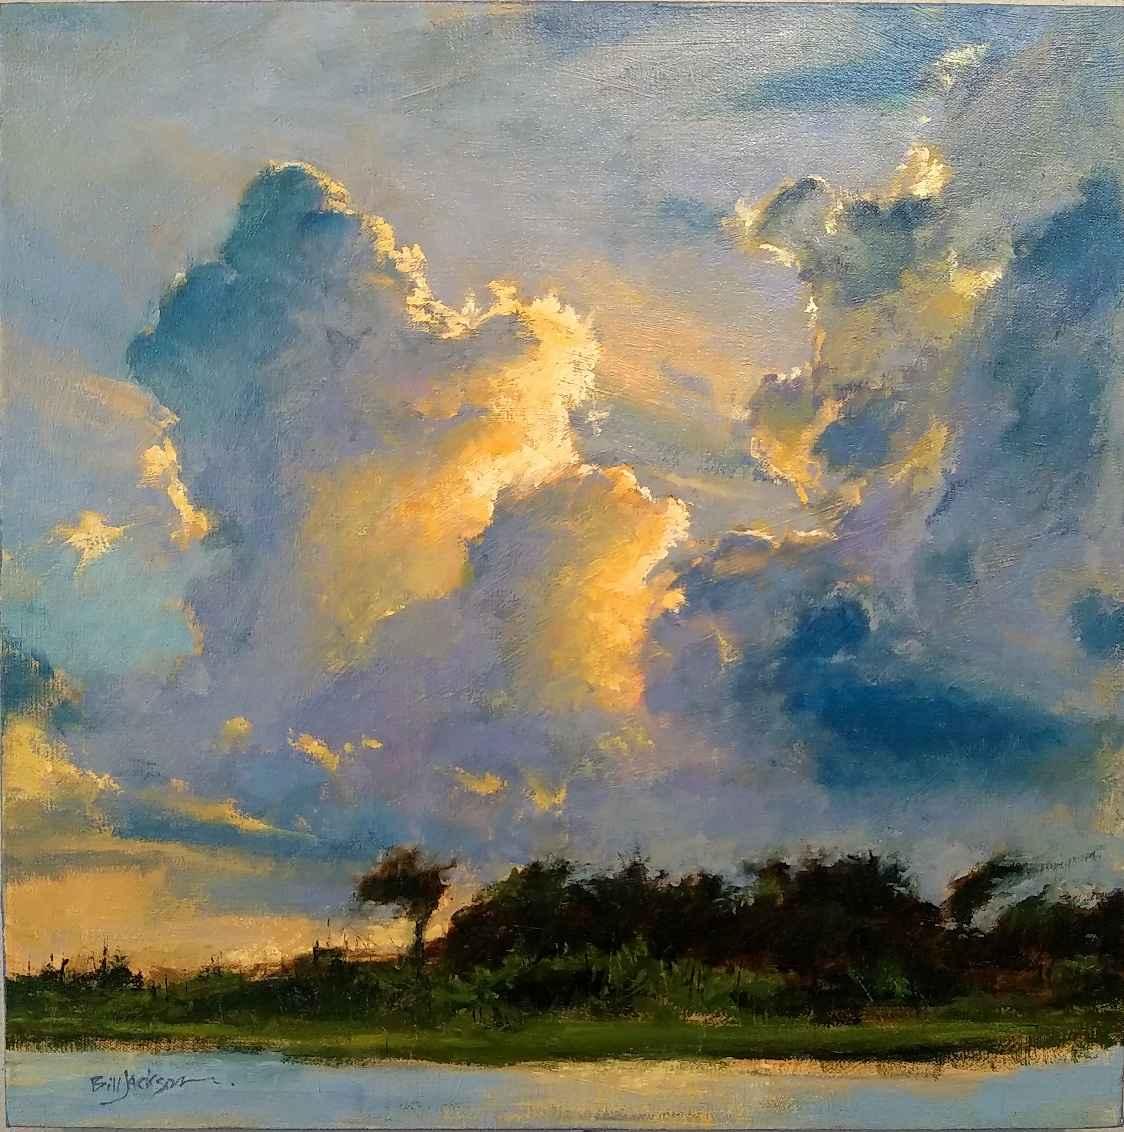 Carson Clouds Arising... by  Bill Jackson - Masterpiece Online